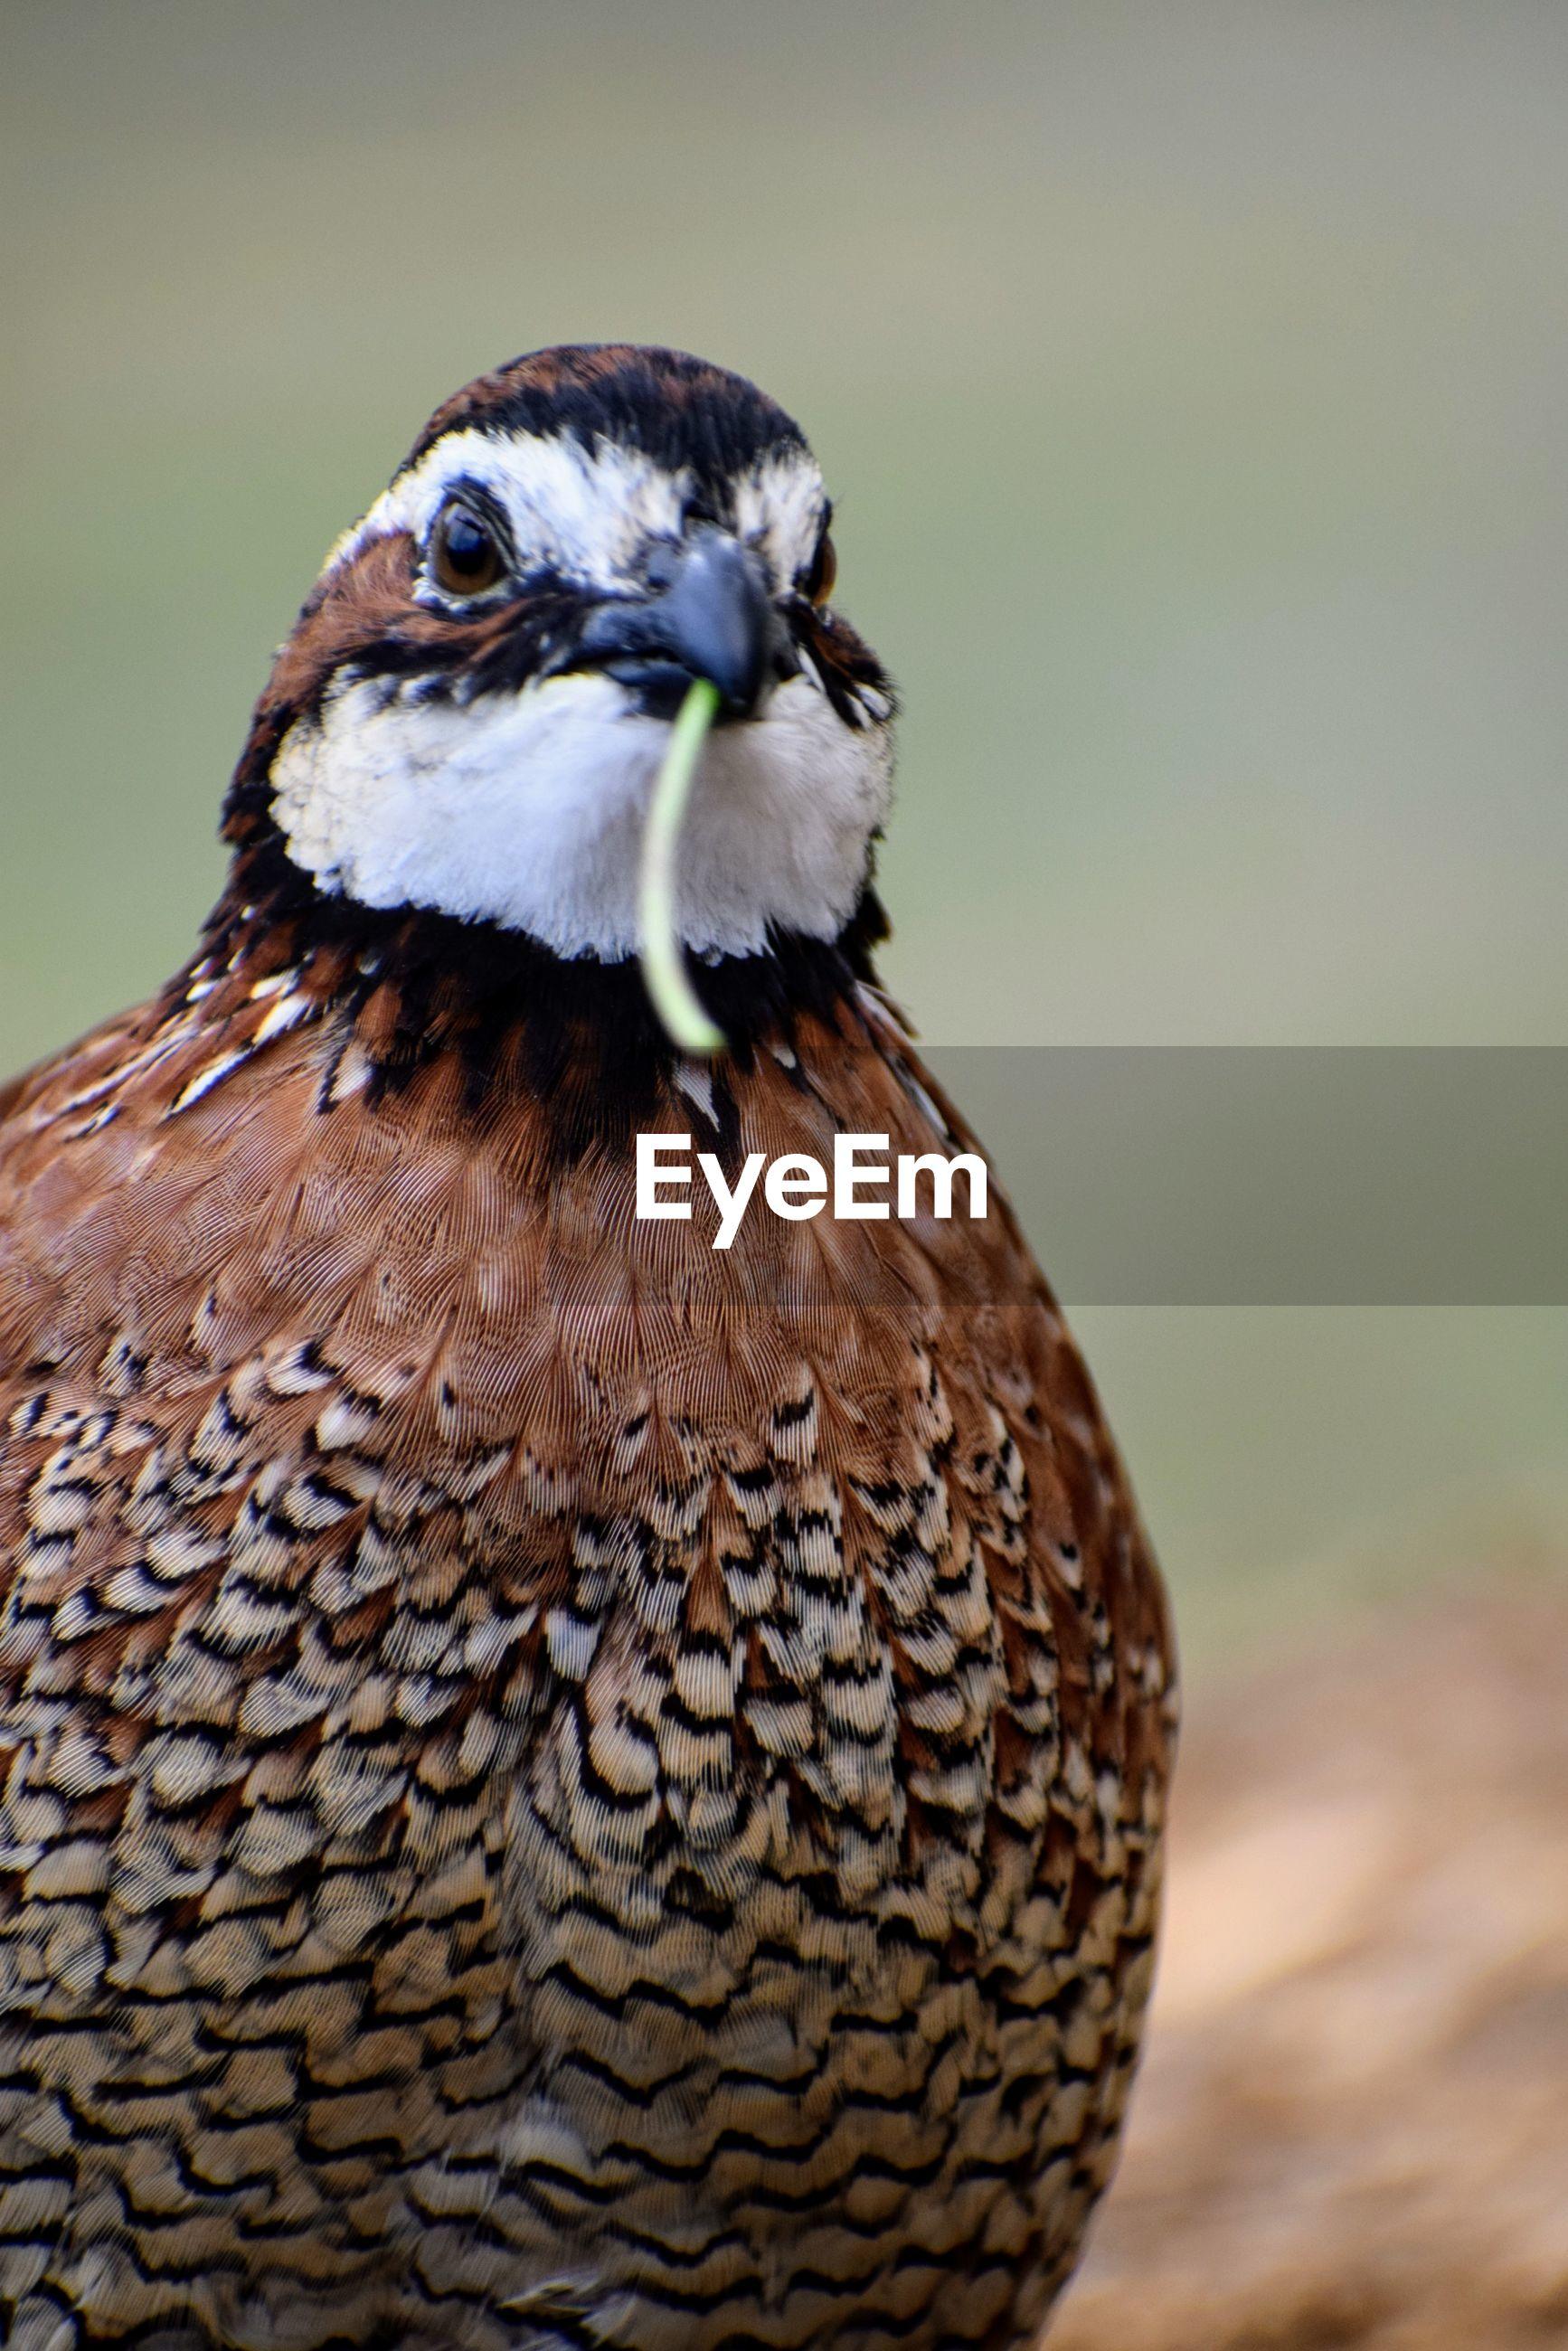 Close-up portrait of bobwhite quail